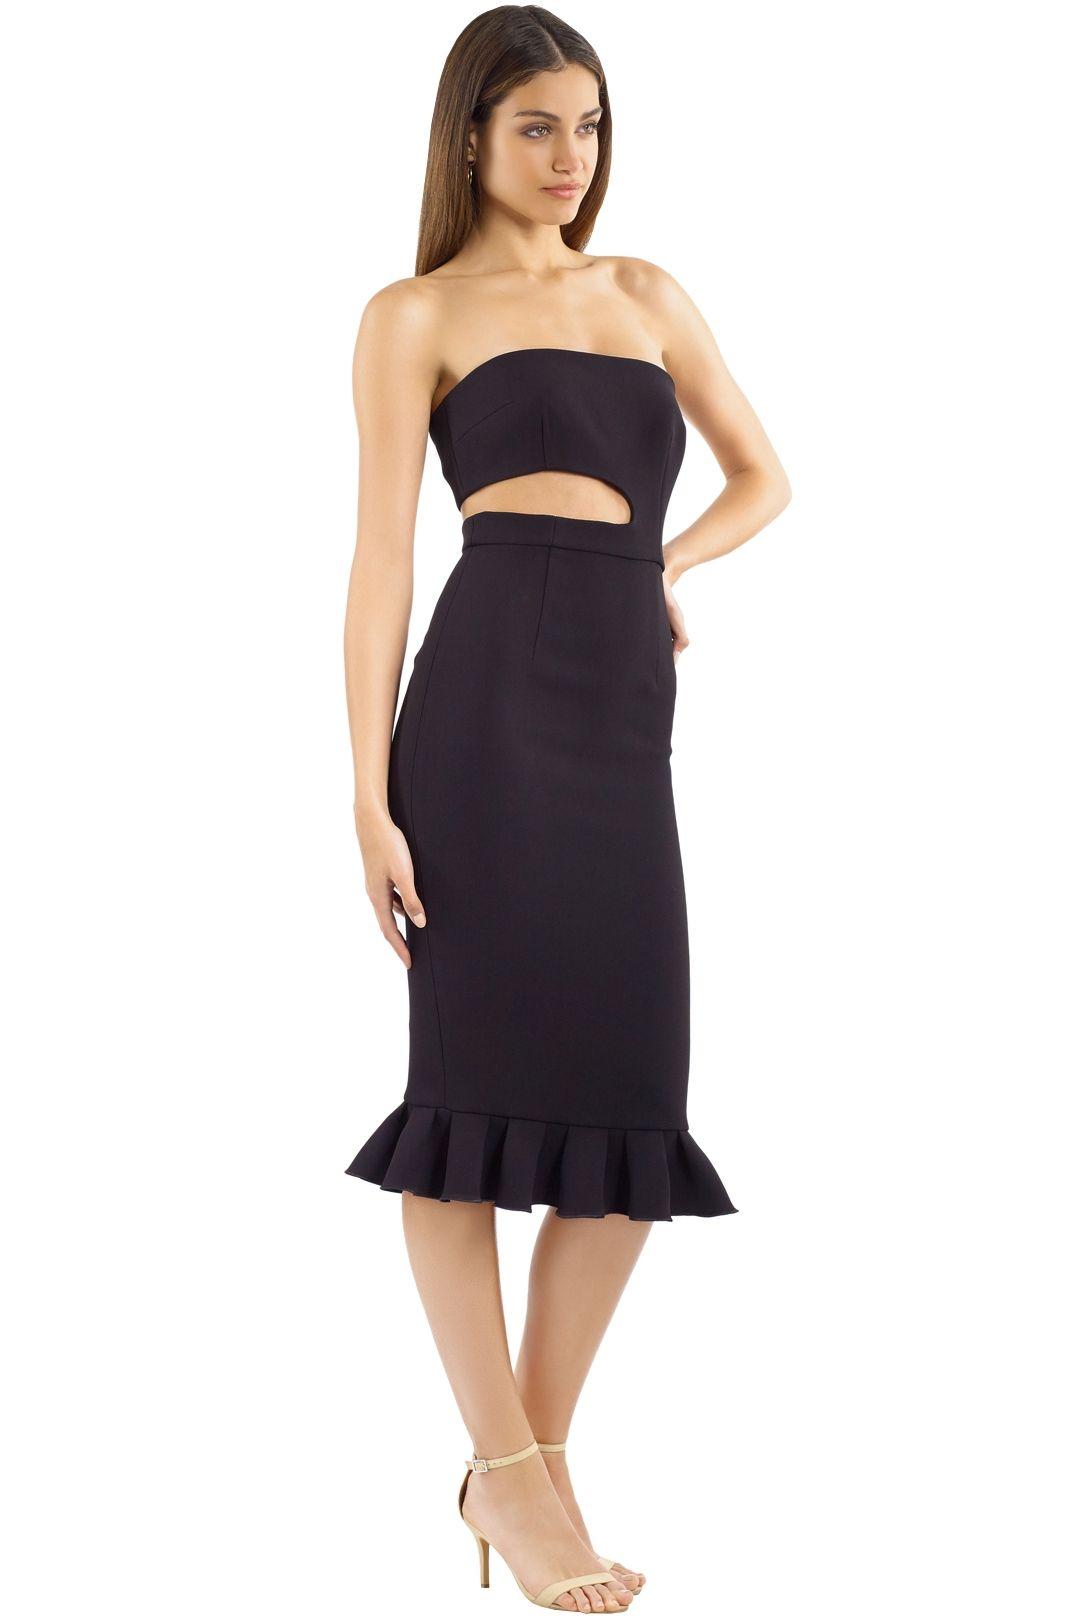 Yeojin Bae - Kaitlin Dress - Black -  Side